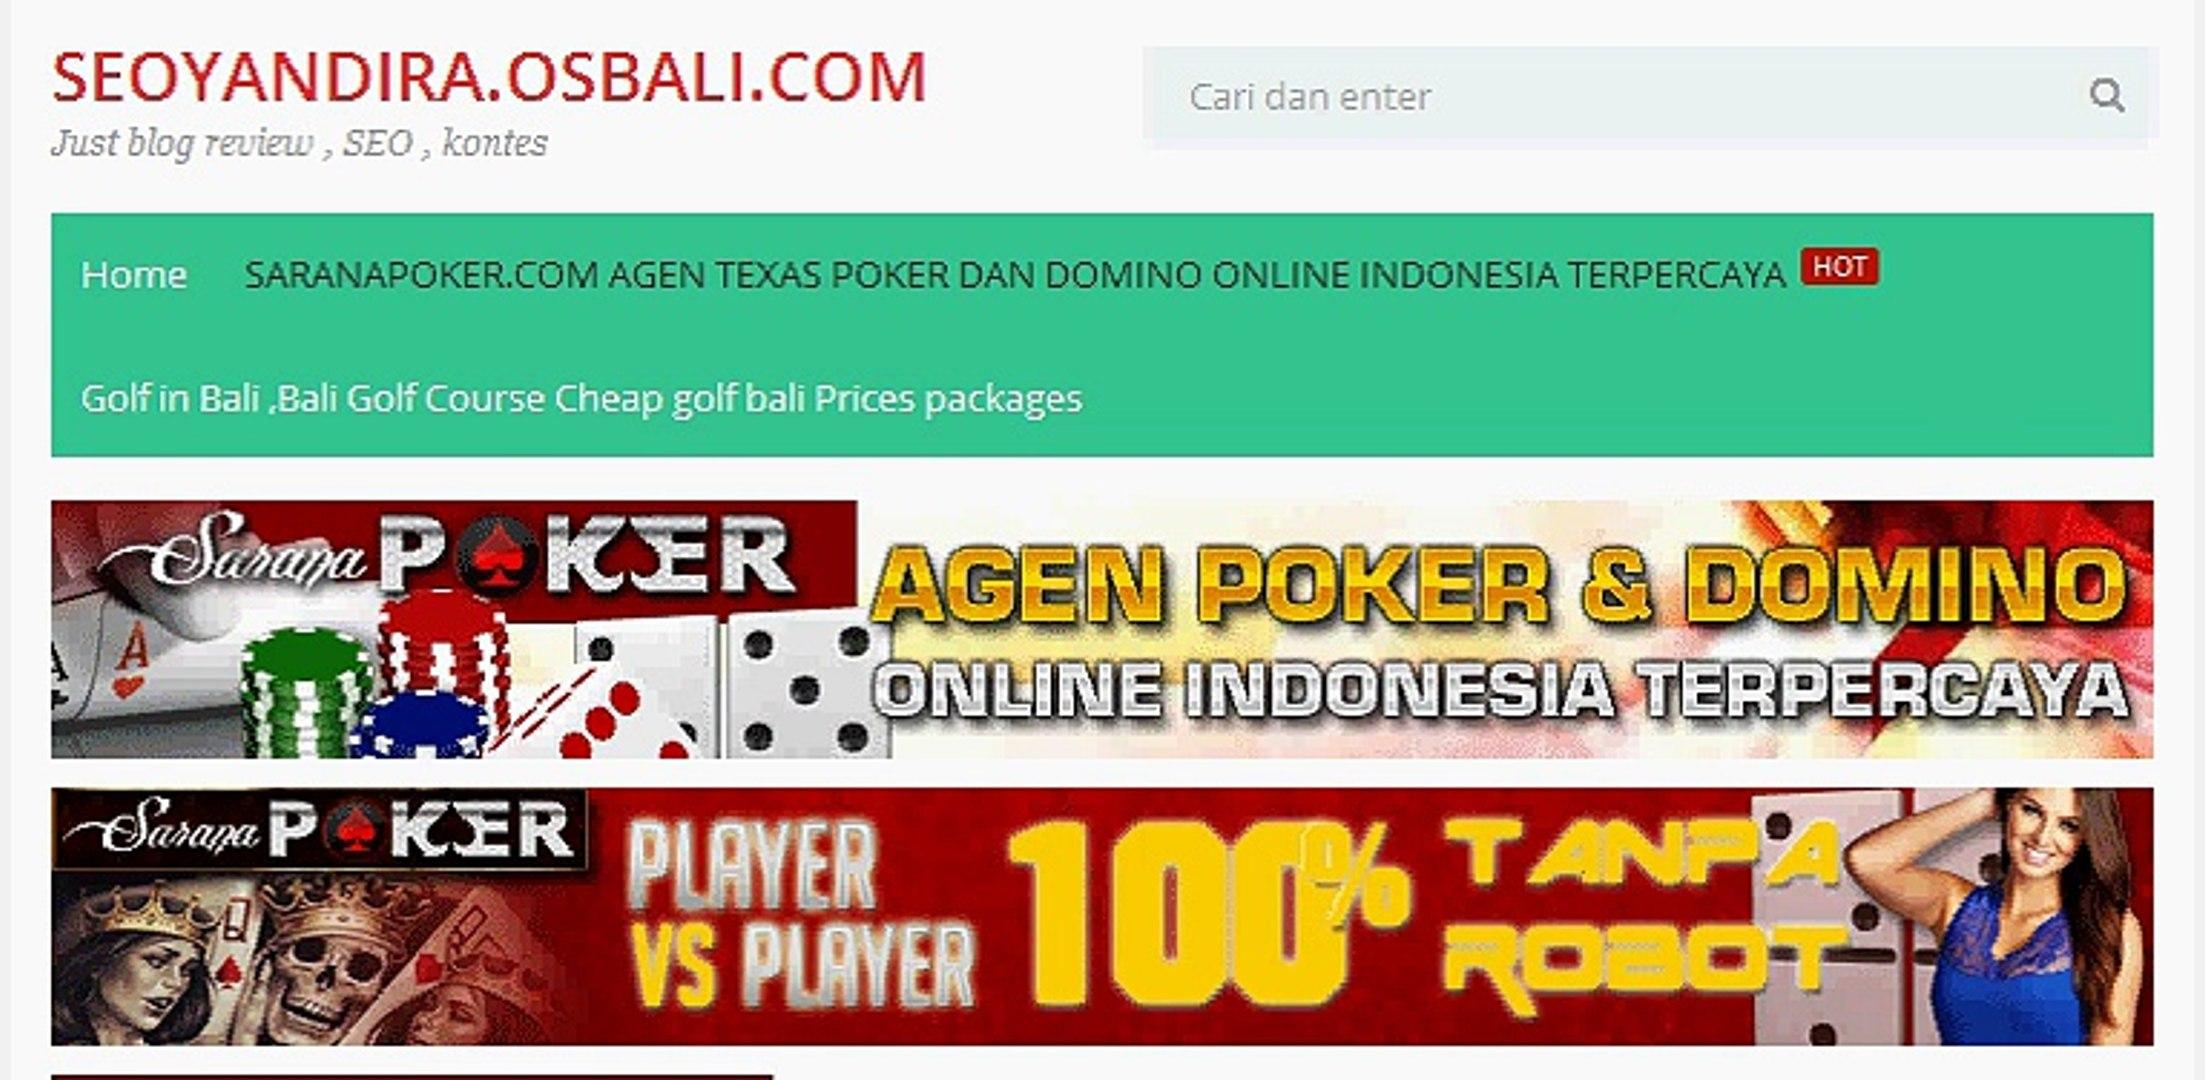 Saranapoker Com Agen Texas Poker Dan Domino Online Indonesia Terpercaya Video Dailymotion